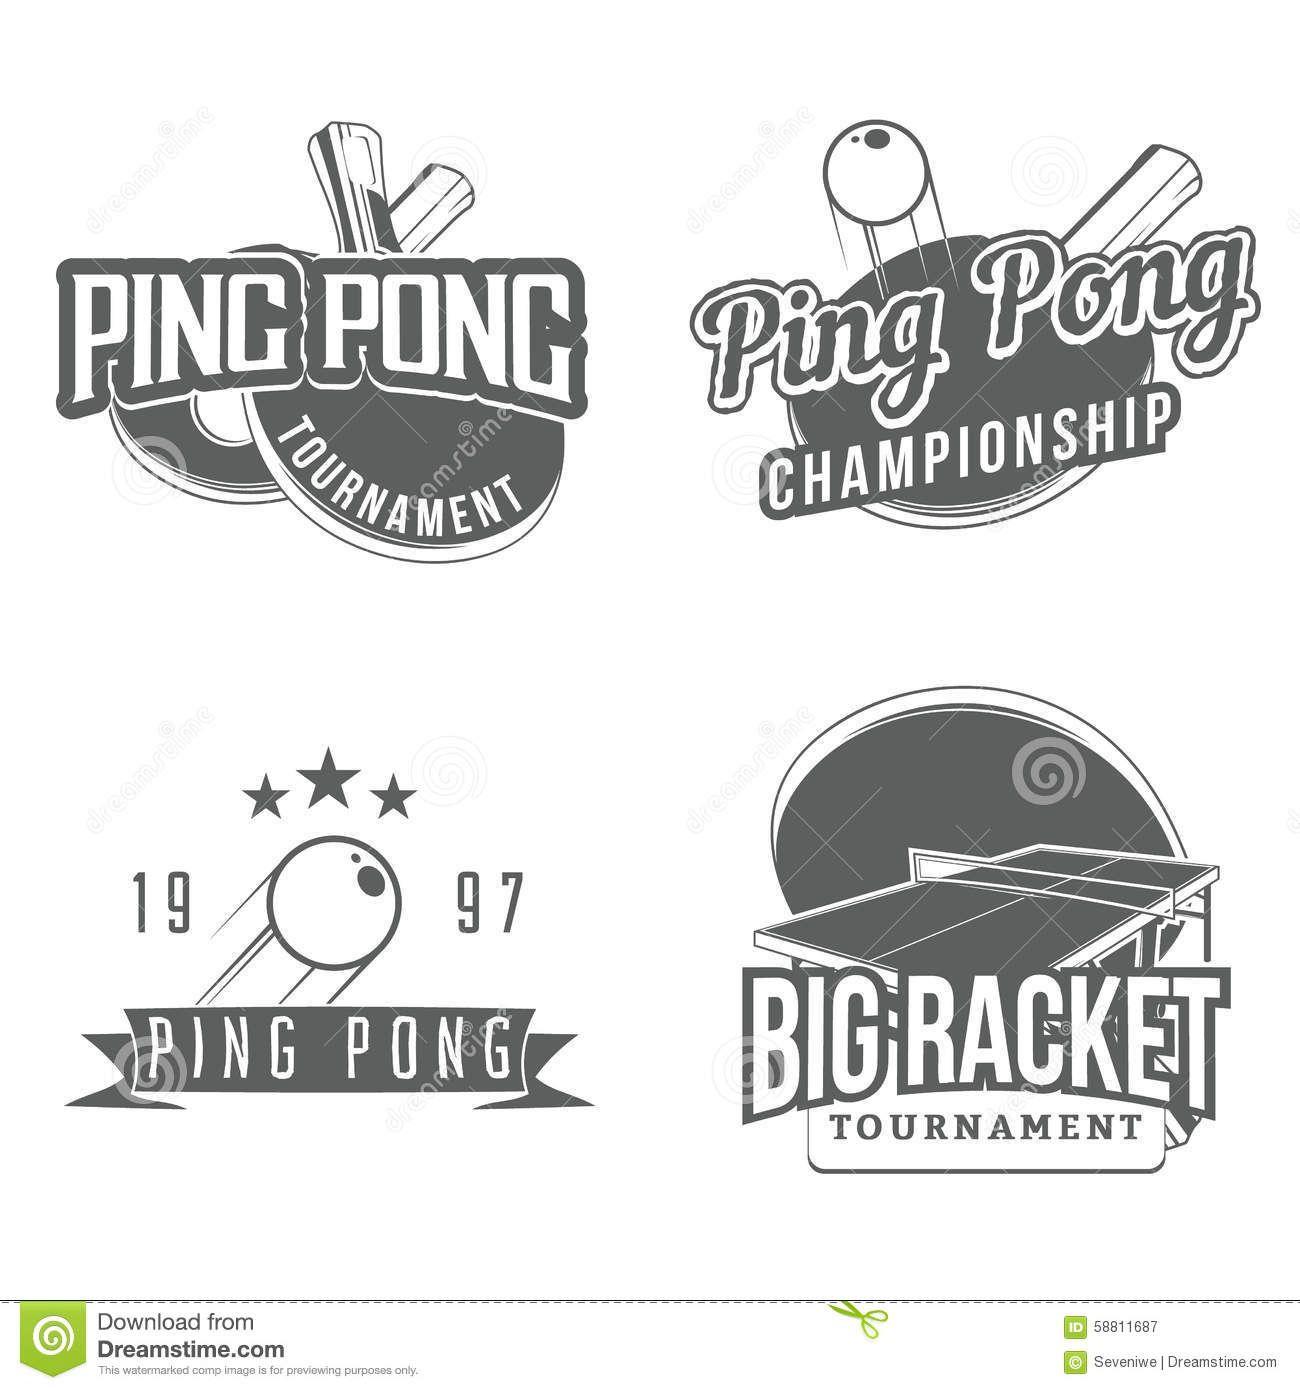 Killerspin JET100 Table Tennis Paddle   Pinterest   Medallas ...